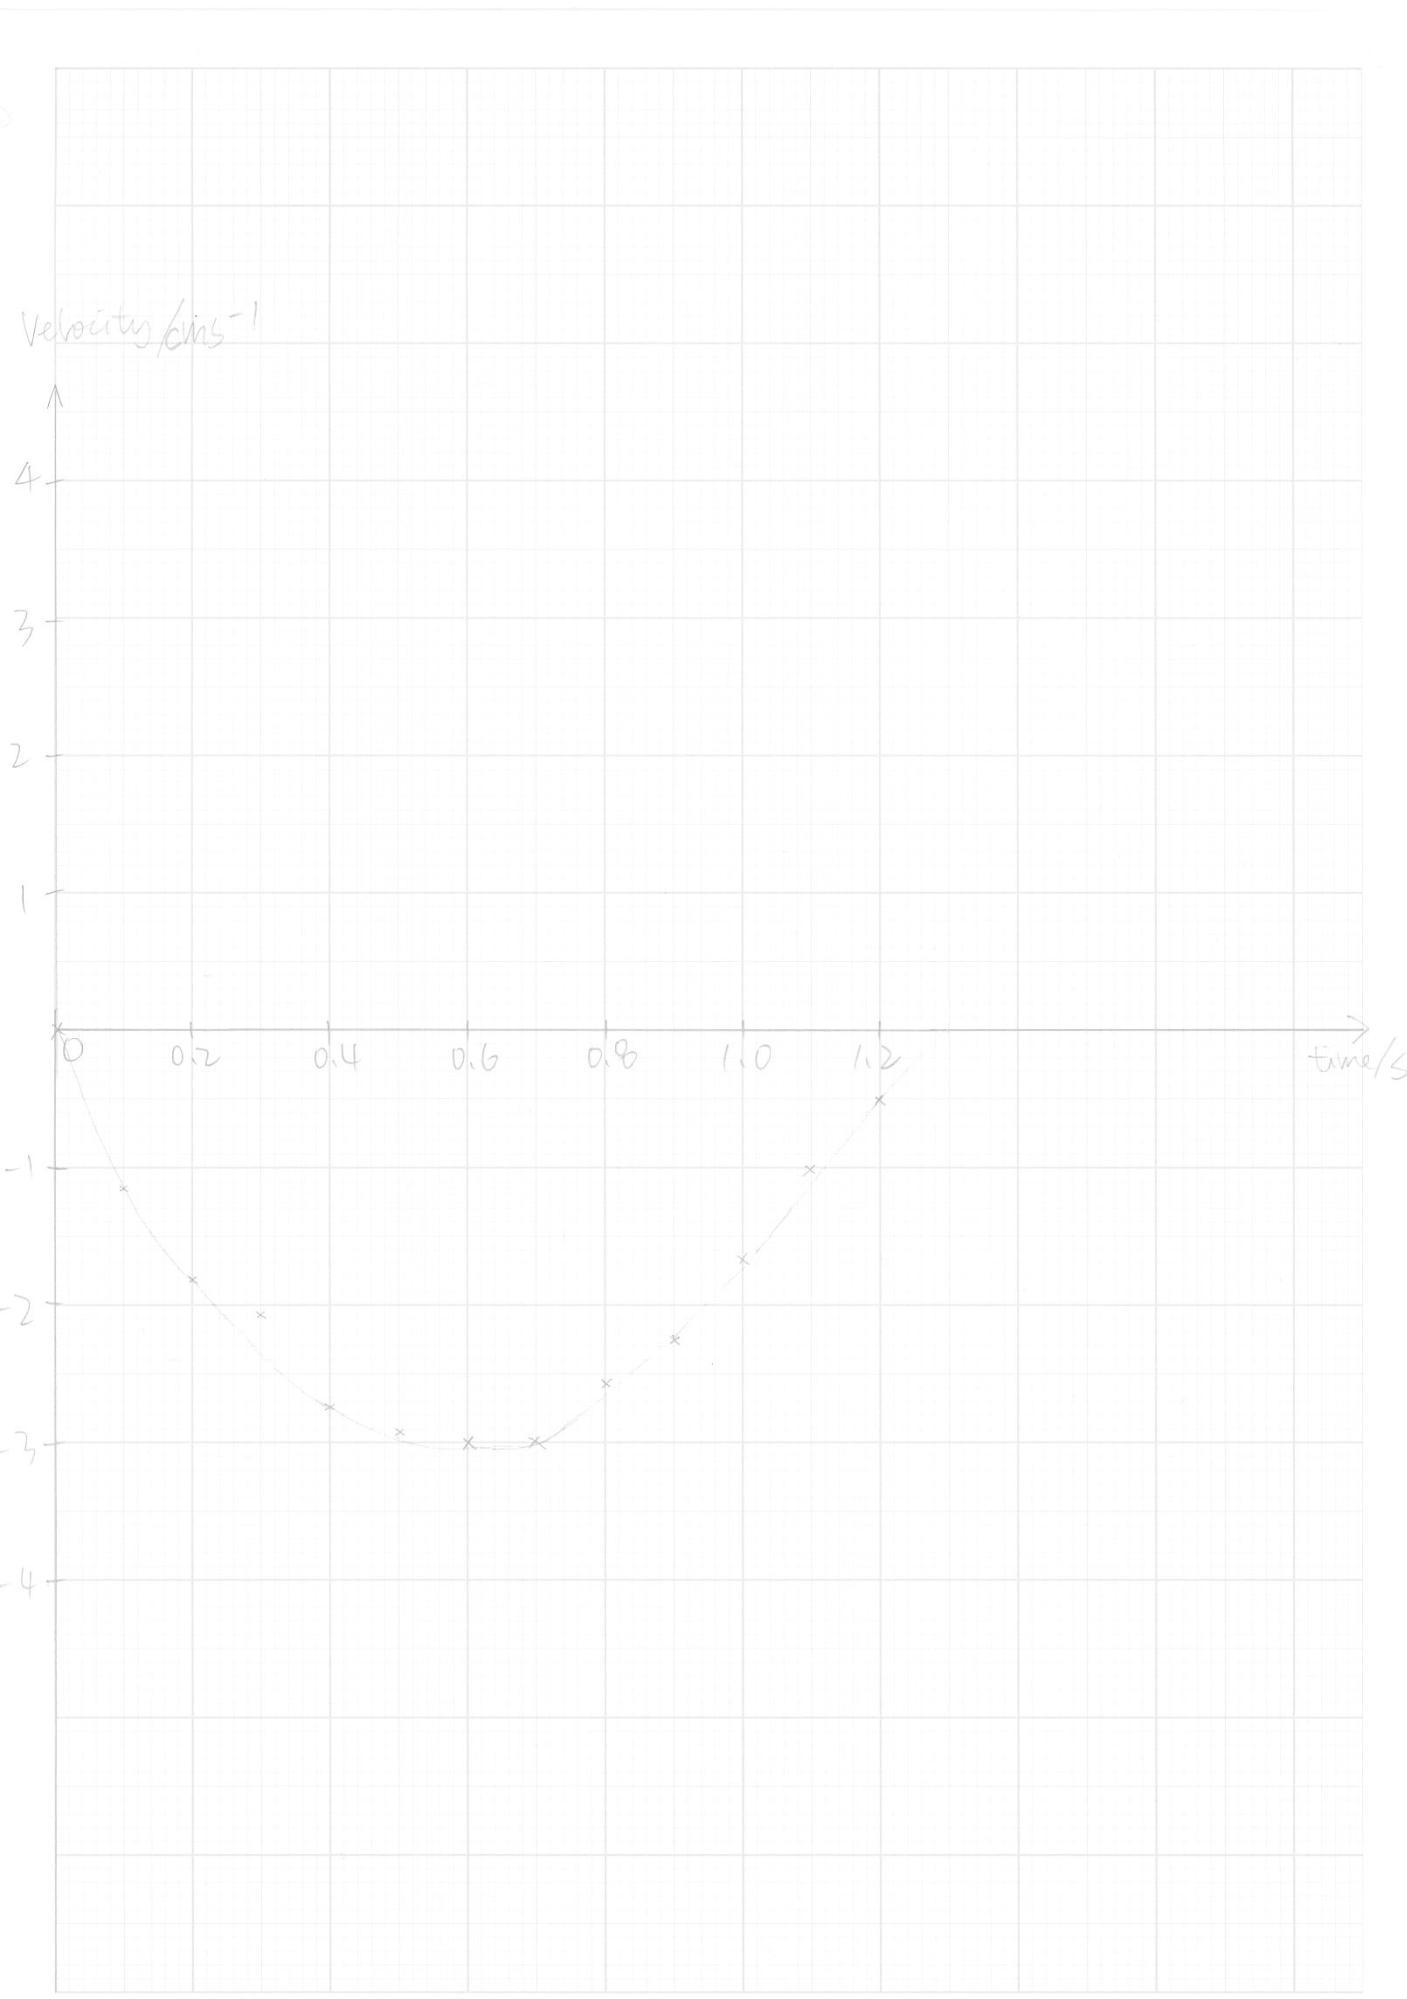 Experiment Report Studying A Simple Harmonic Oscillator